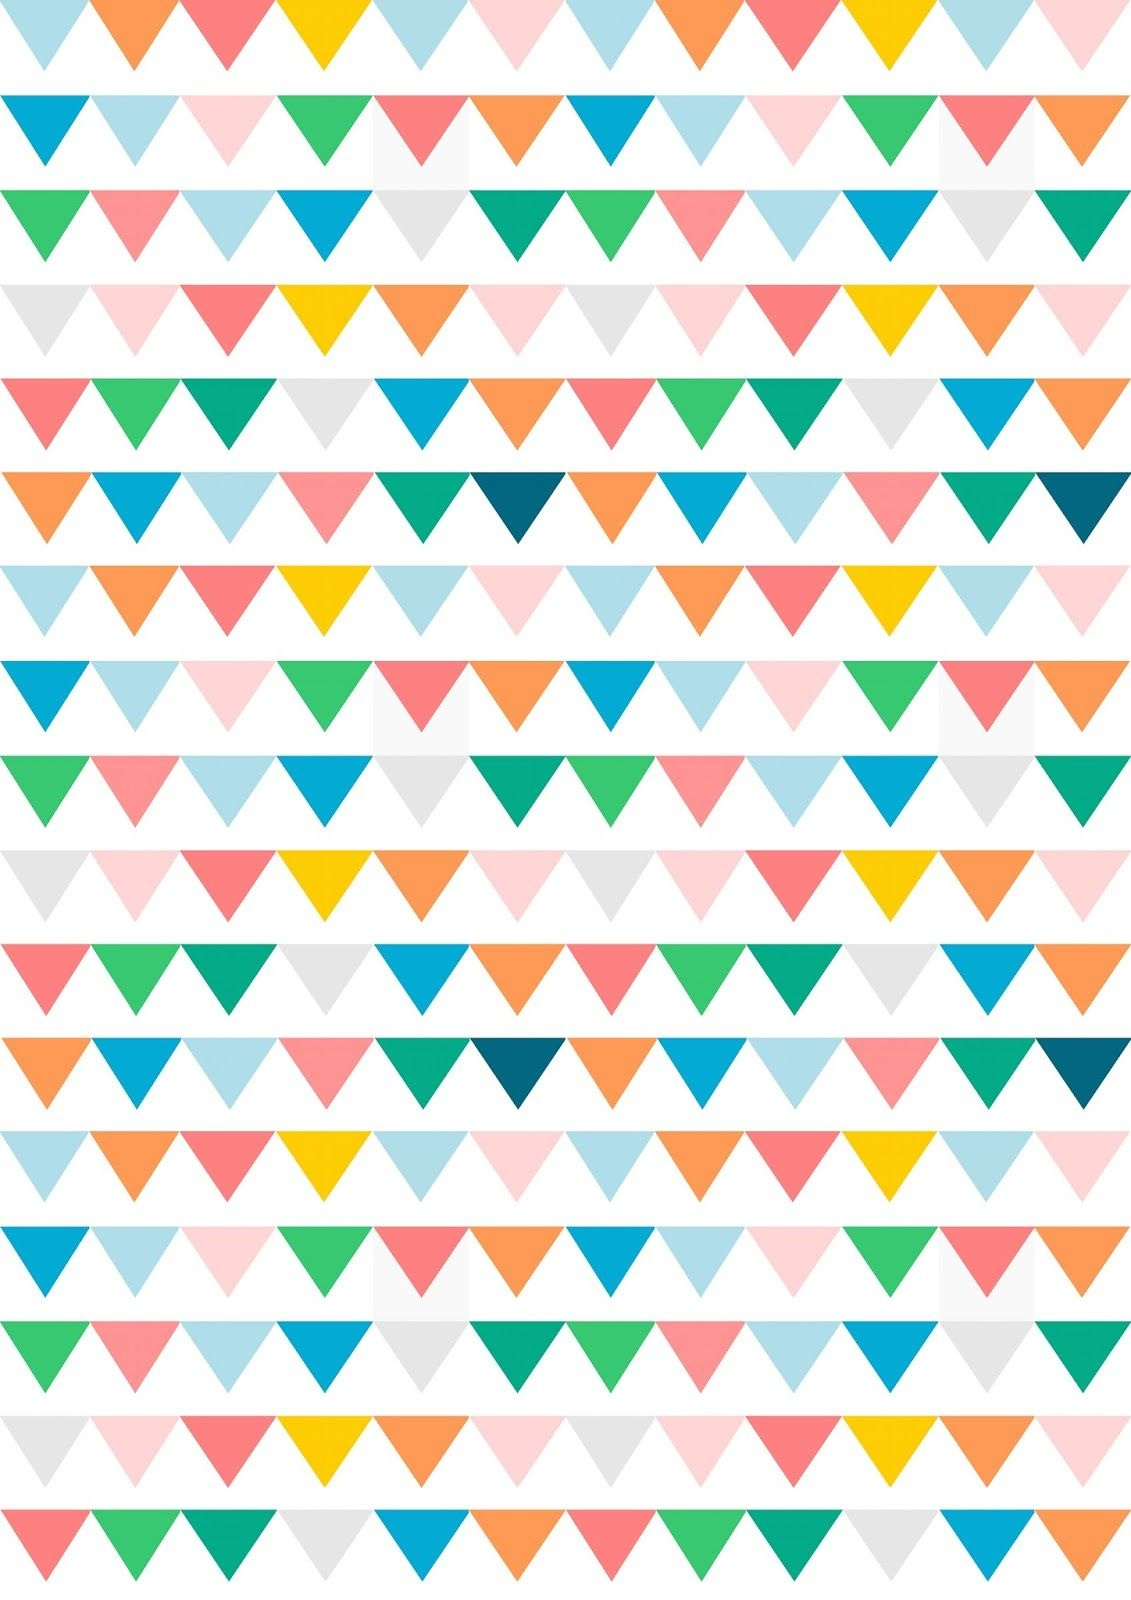 Free Digital Bunting Scrapbooking Paper - Ausdruckbares - Free Printable Scrapbook Paper